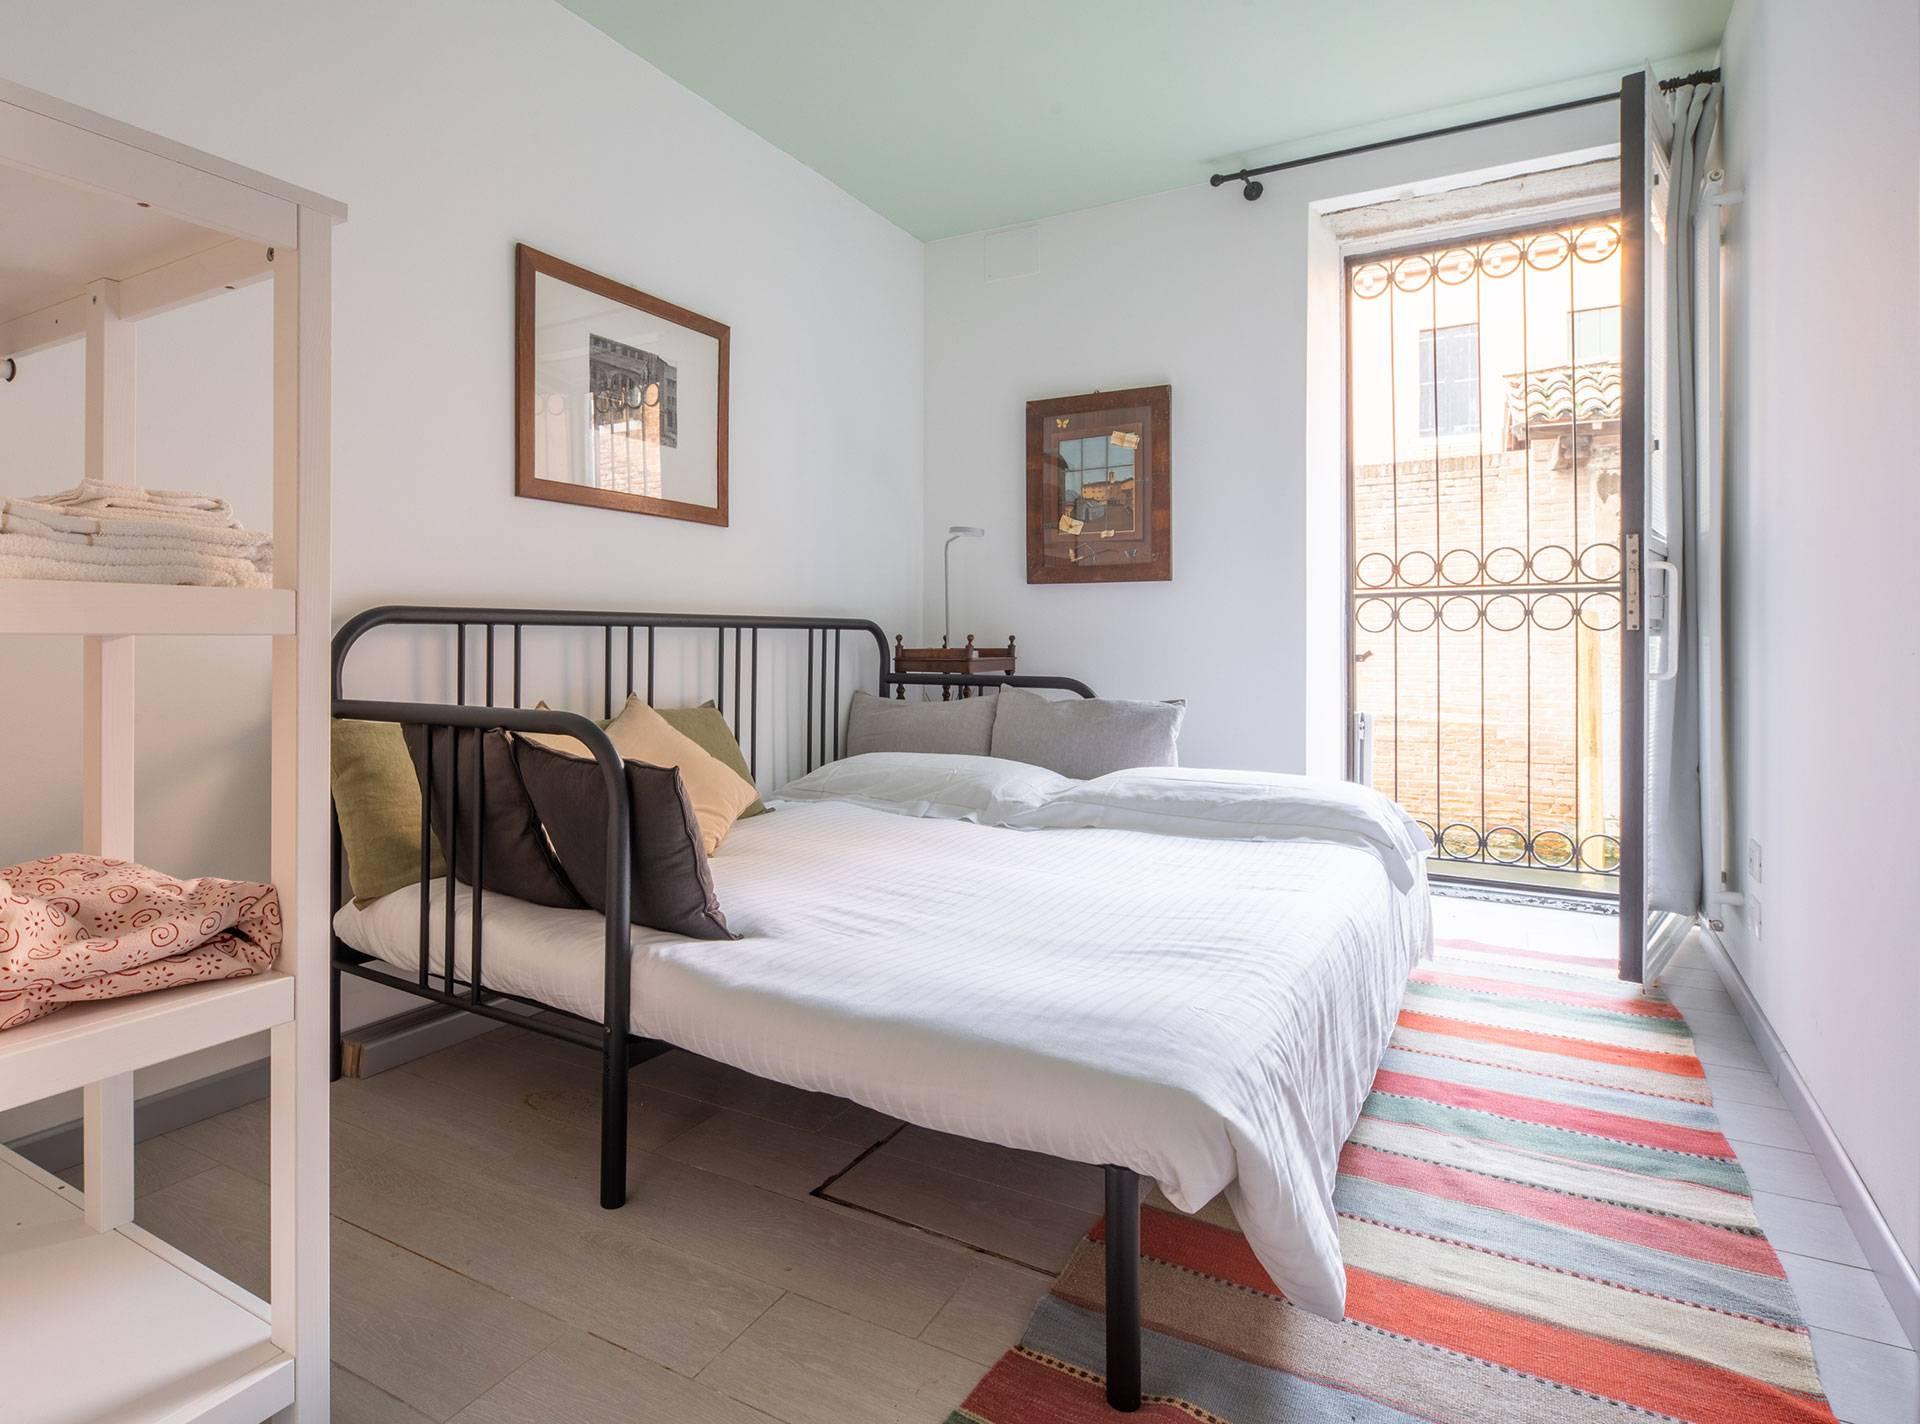 second bedroom with double sofa-bed and water door